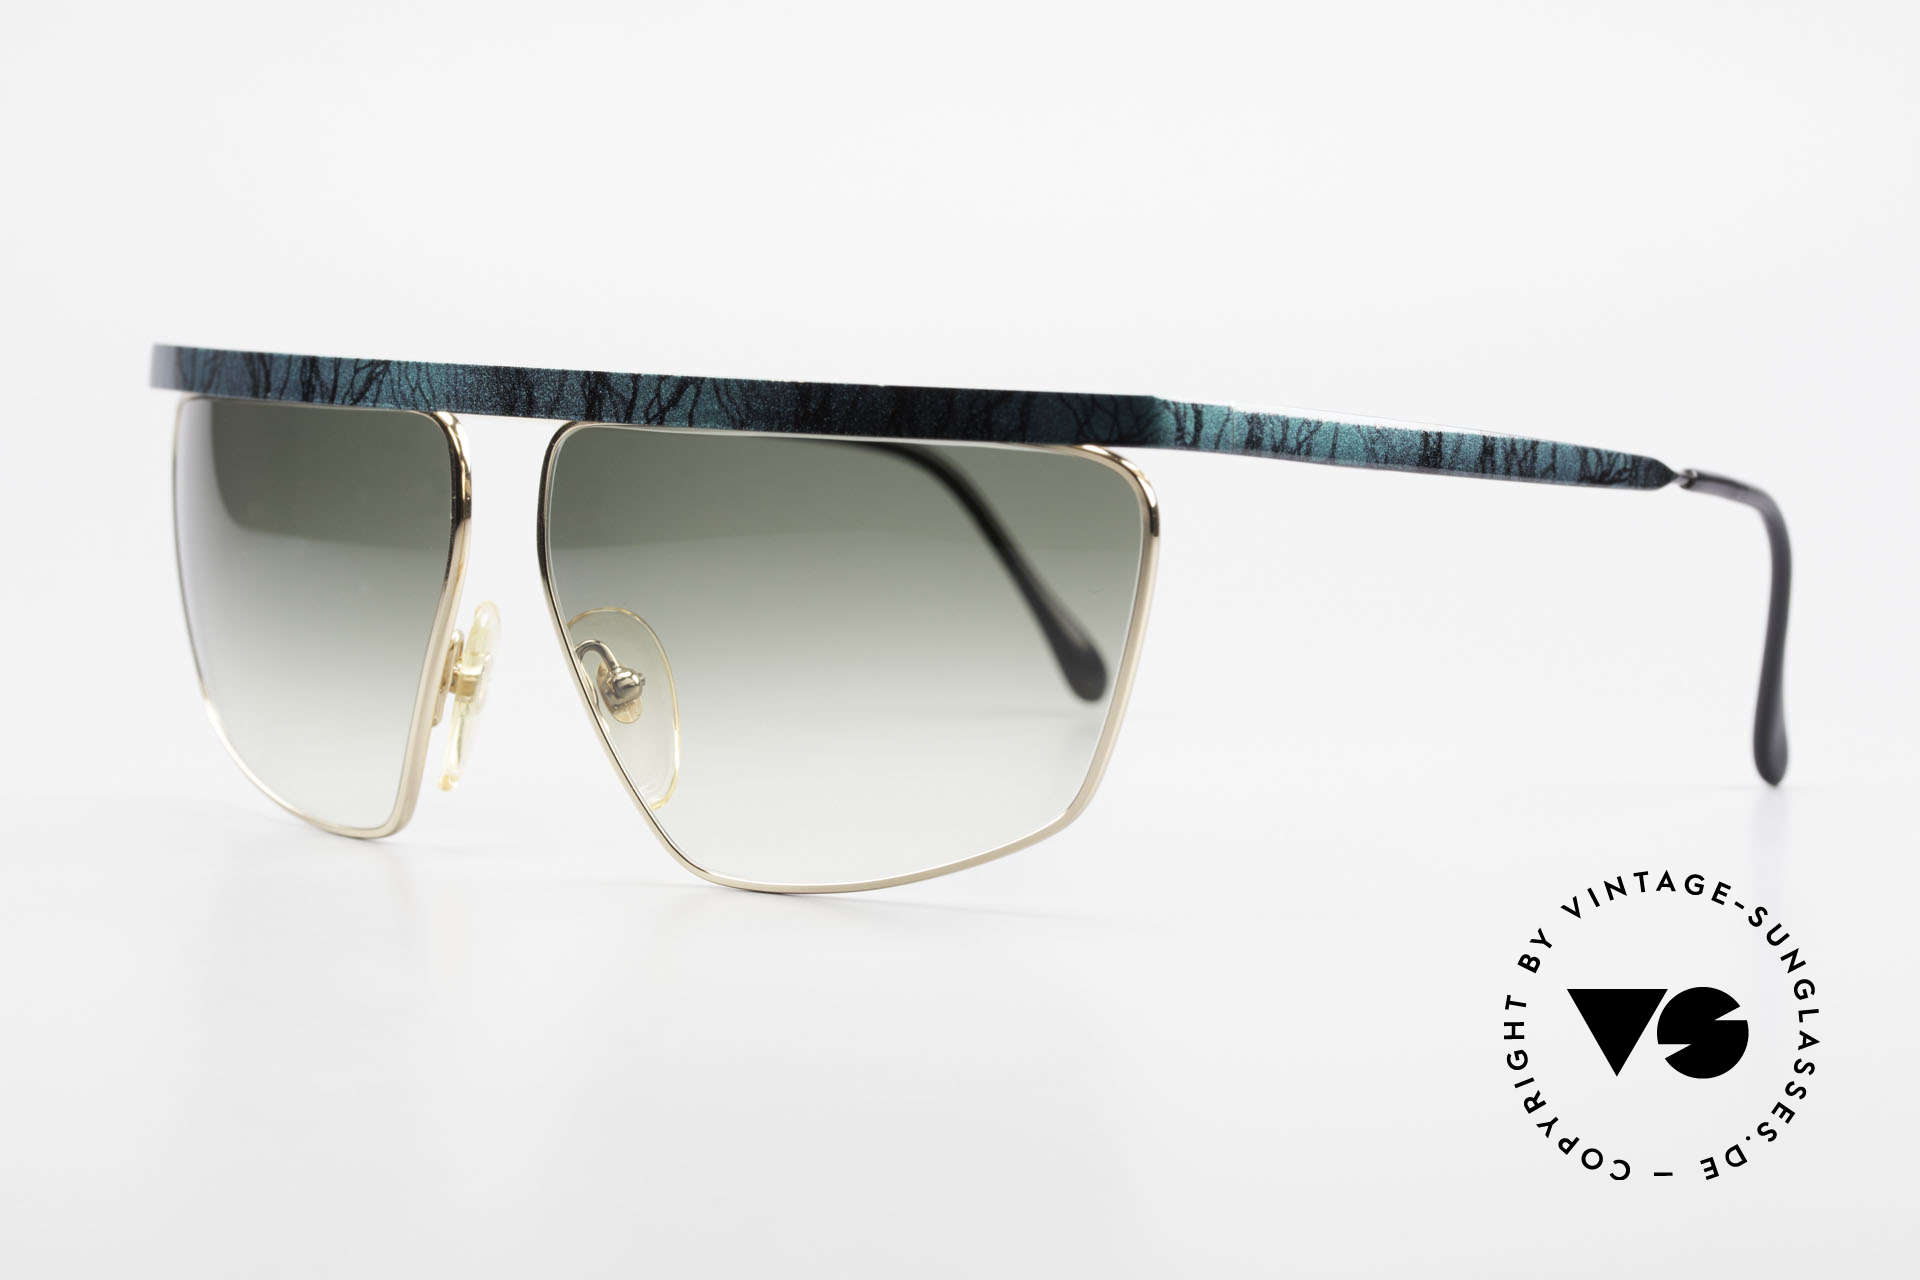 Casanova CN7 Luxury Sunglasses Gold-Plated, green-gradient sun lenses (for 100% UV protection), Made for Men and Women